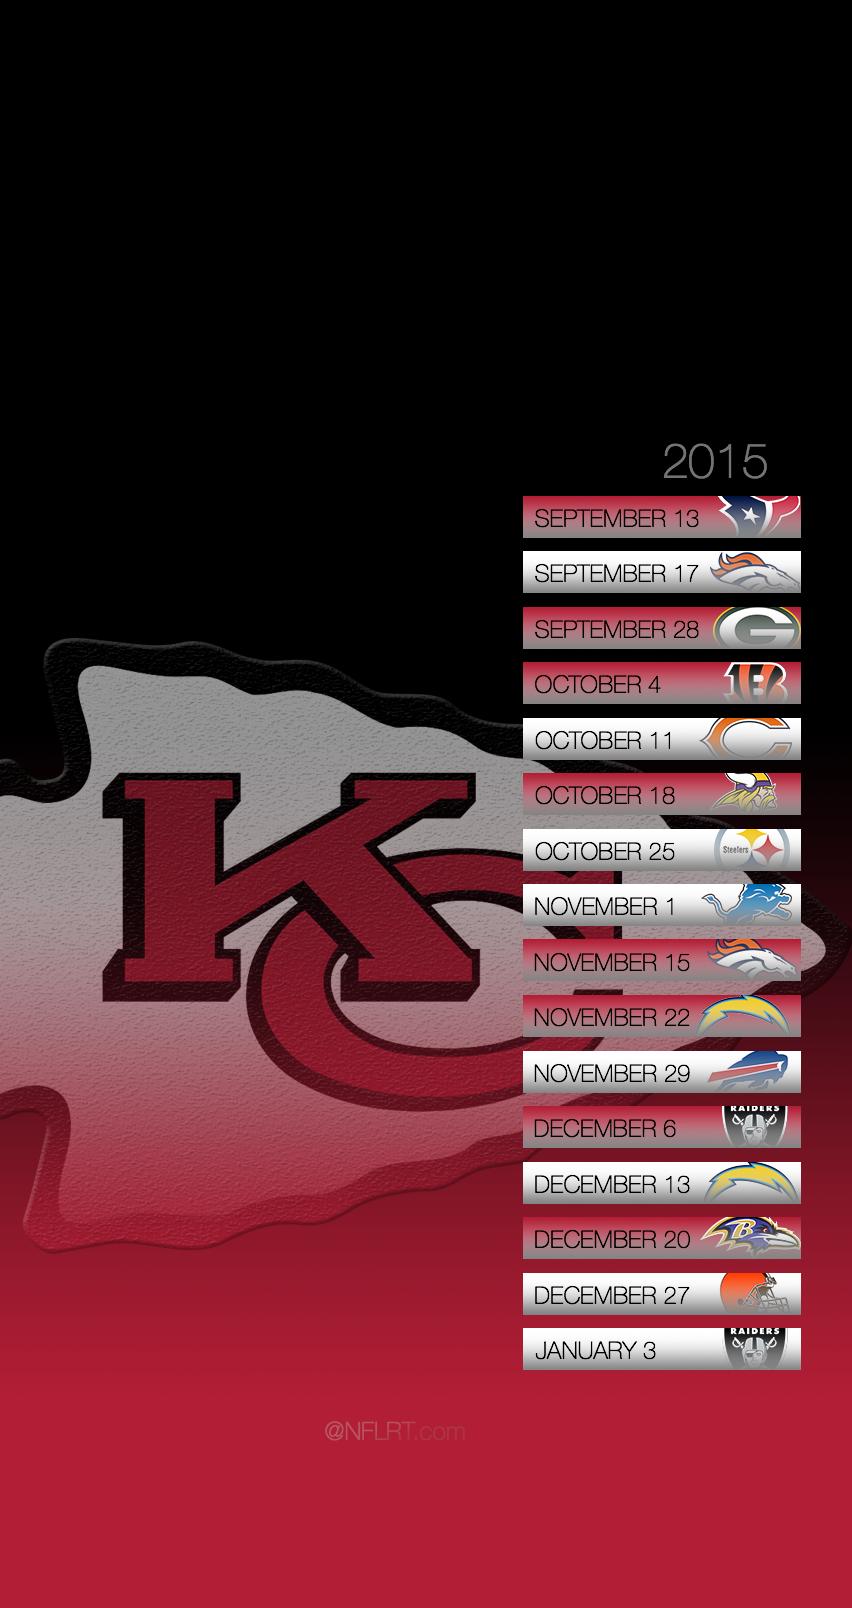 45 Chiefs Wallpaper 2015 On Wallpapersafari